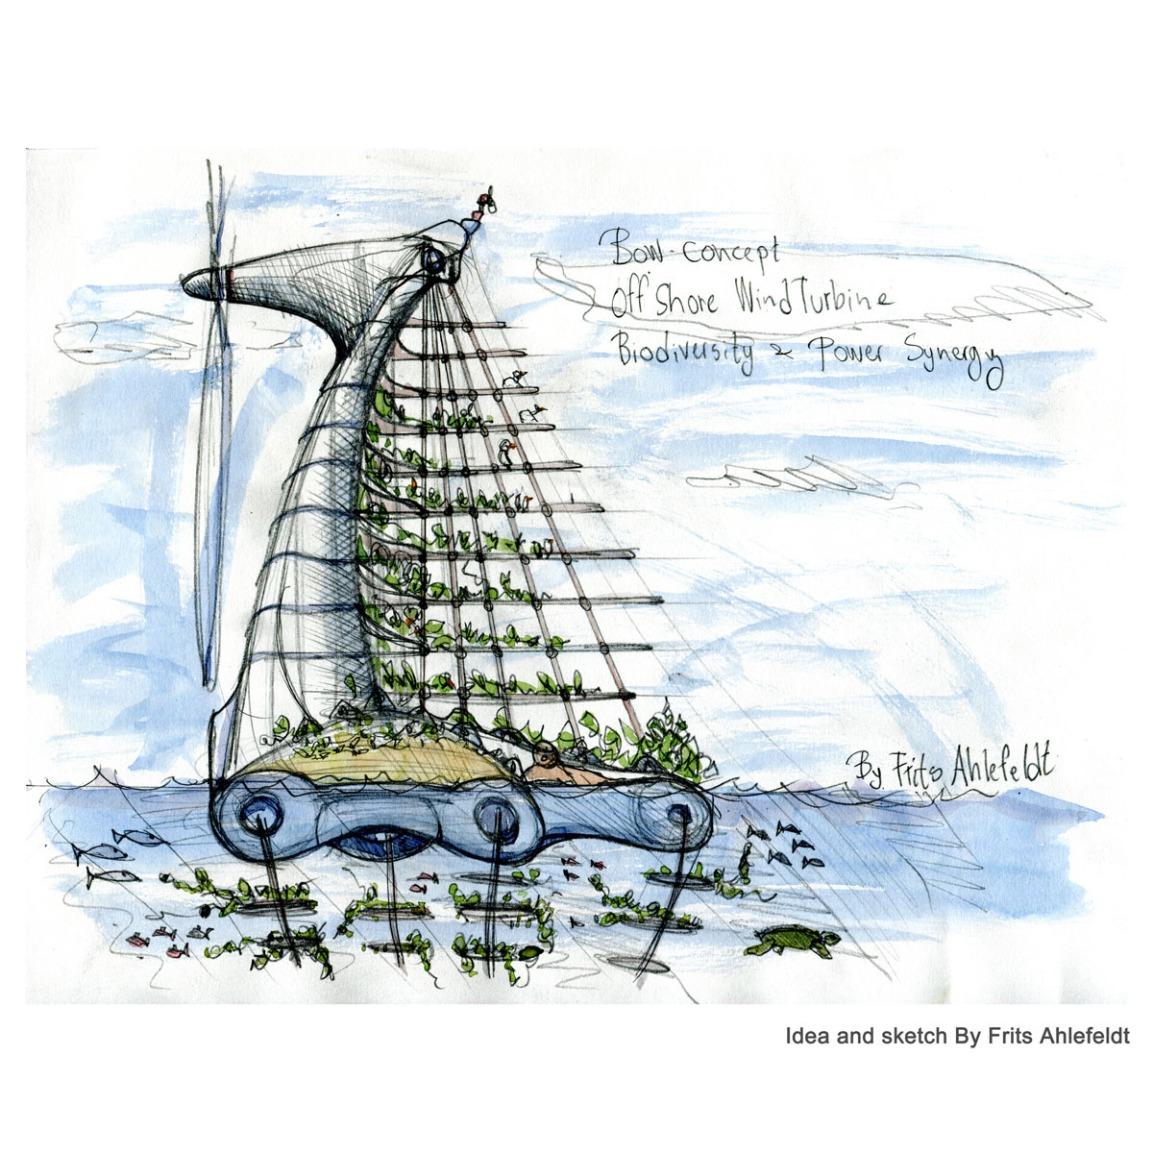 Bow wind turbine biodiversityconcept